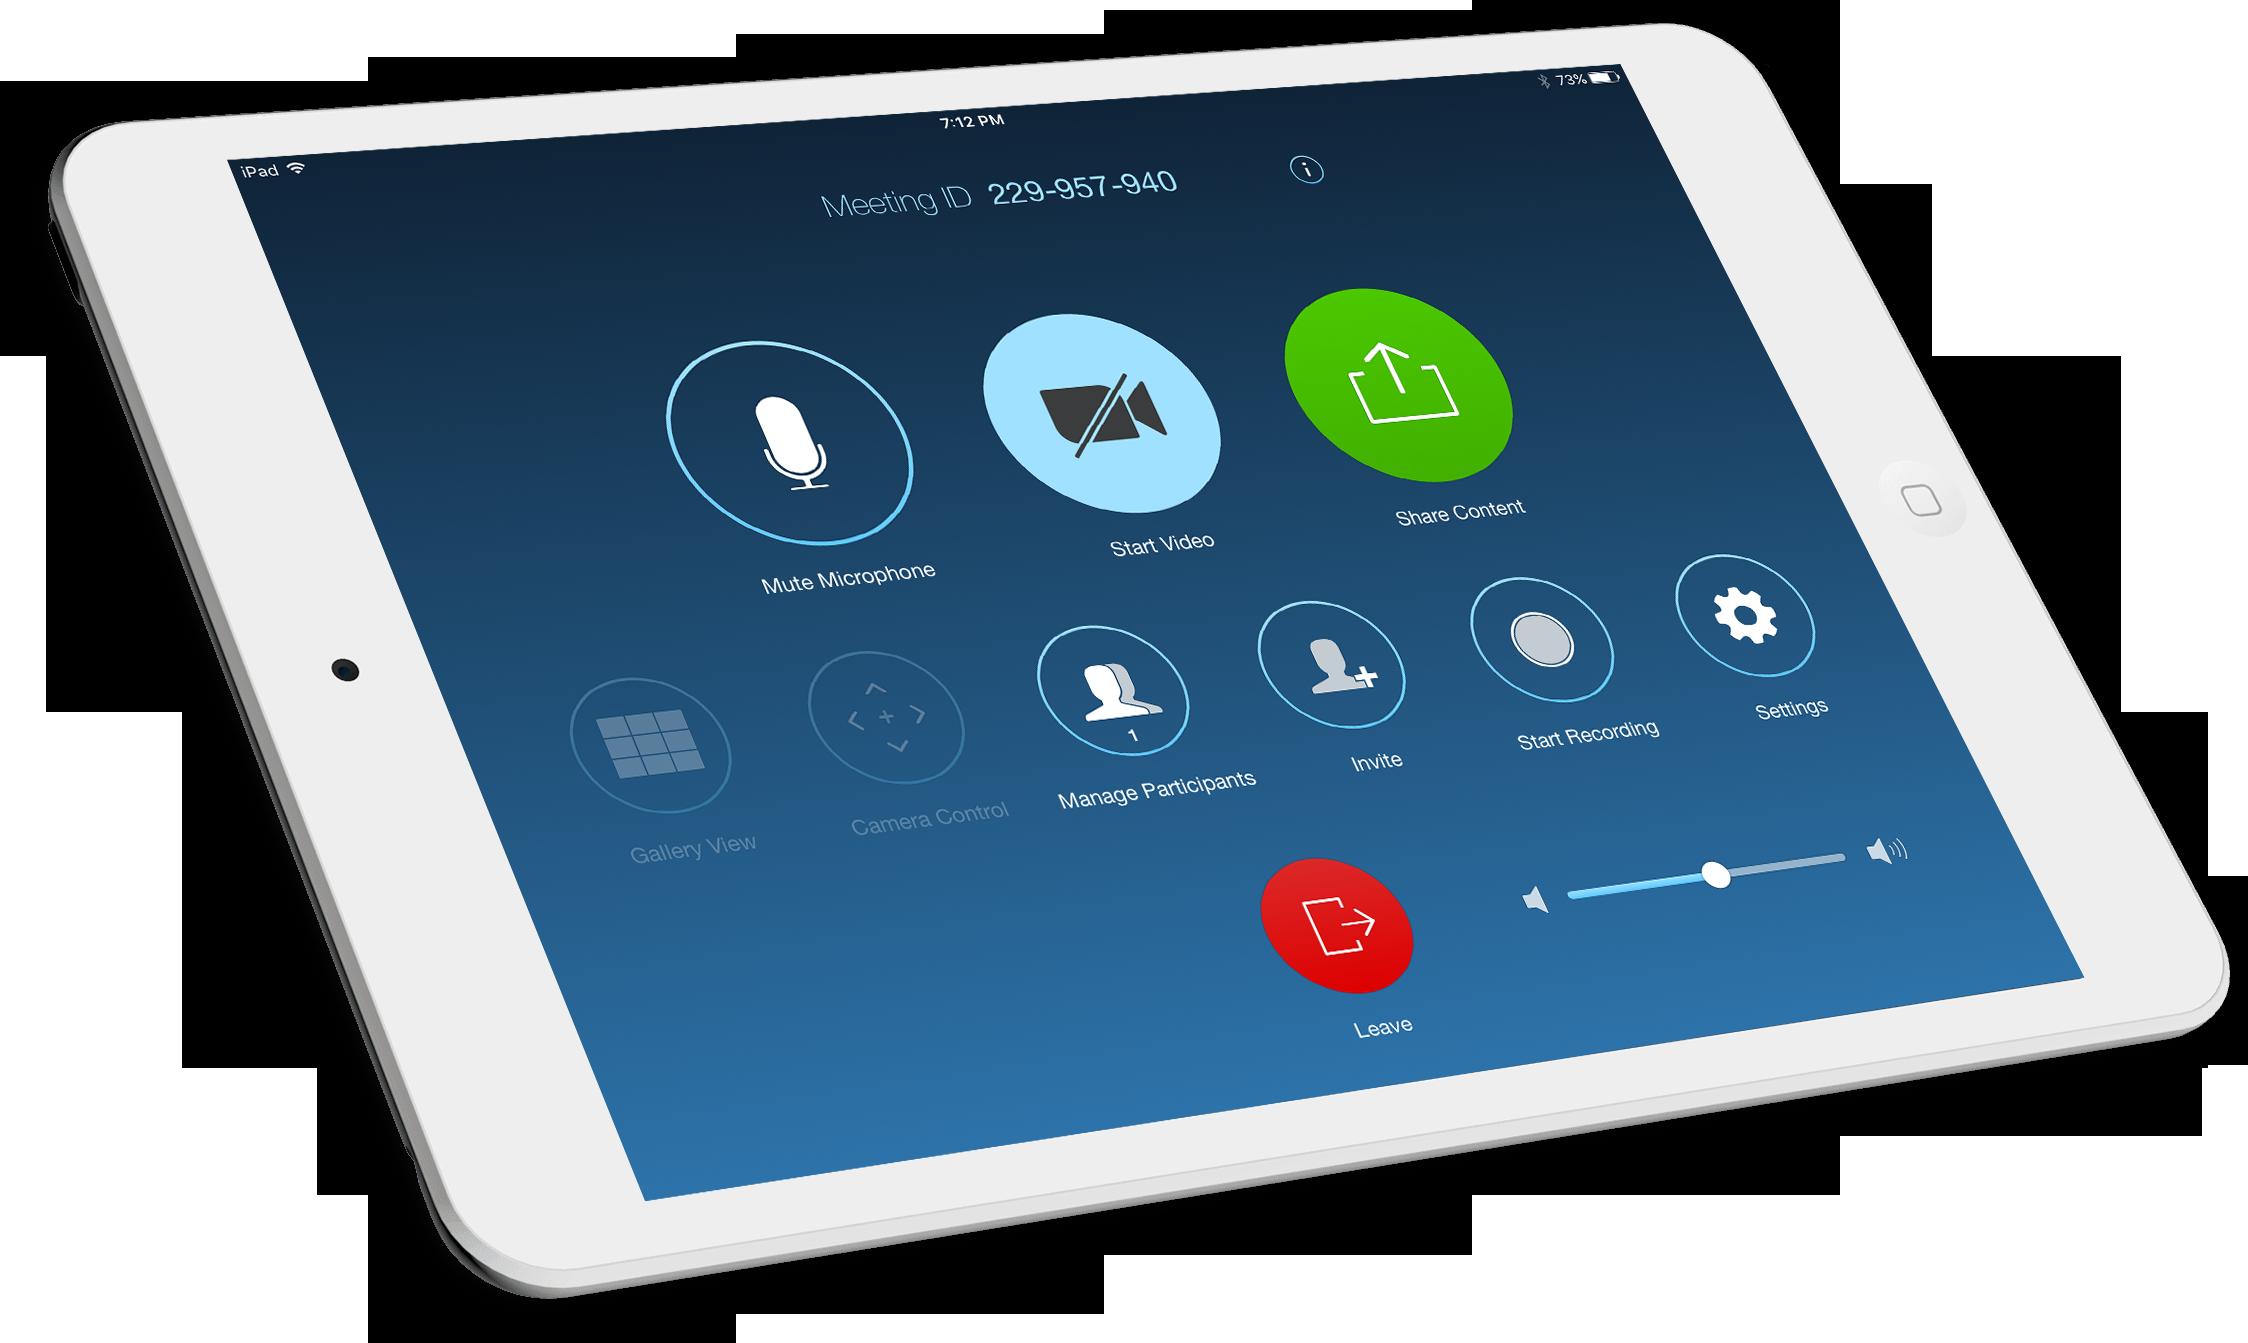 Ipad app zoom academic. Clipart rock tablet